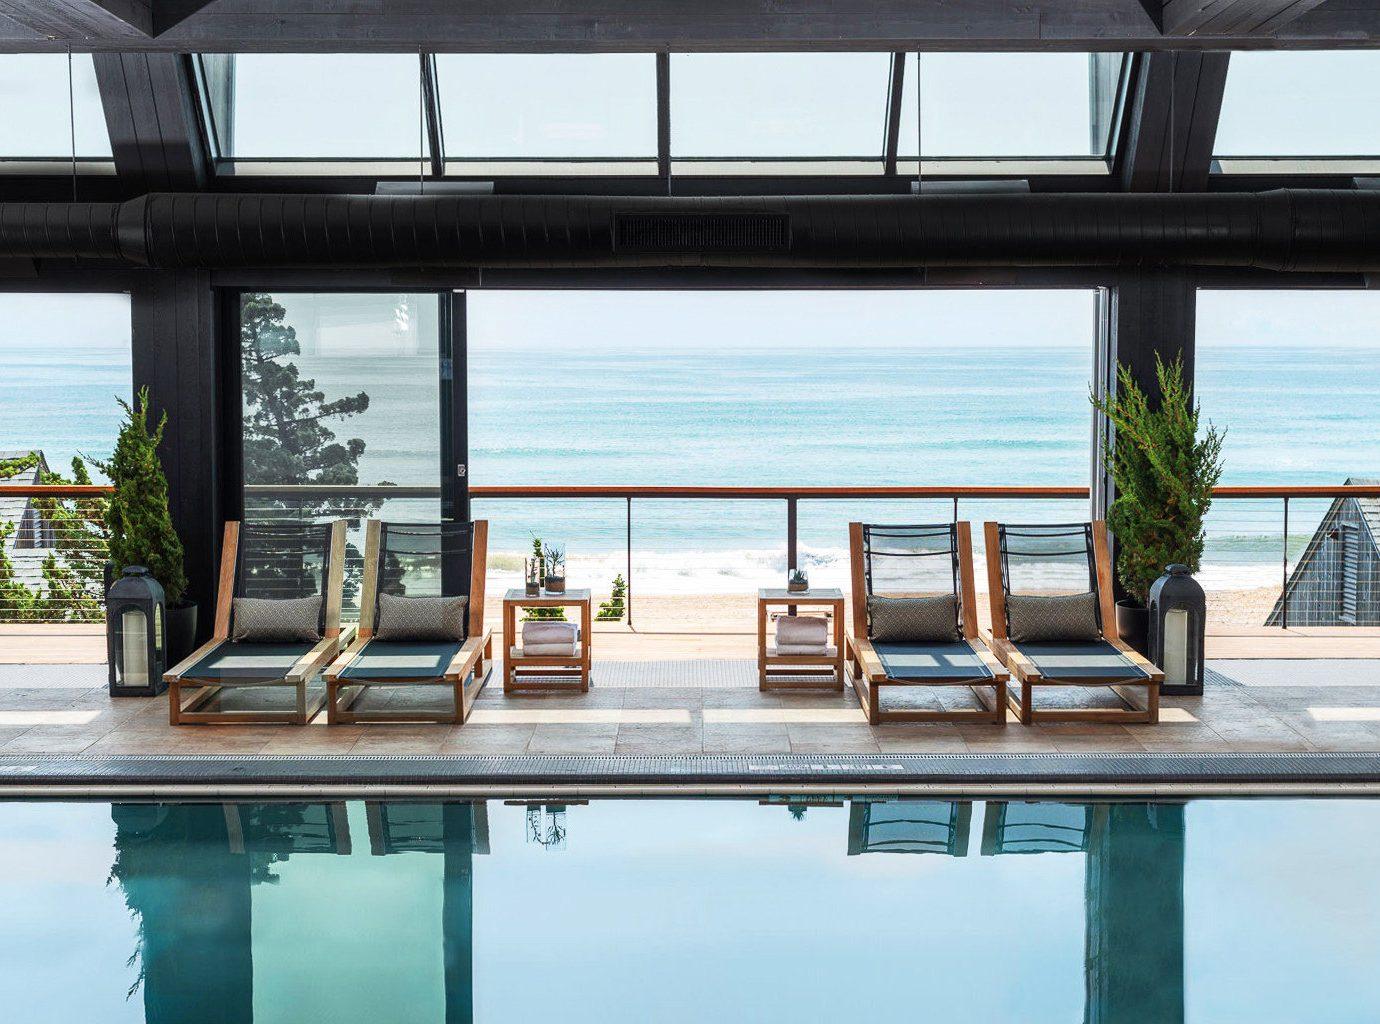 Hotels Ocean Pool Resort Trip Ideas window property building swimming pool house vacation Architecture estate home condominium interior design